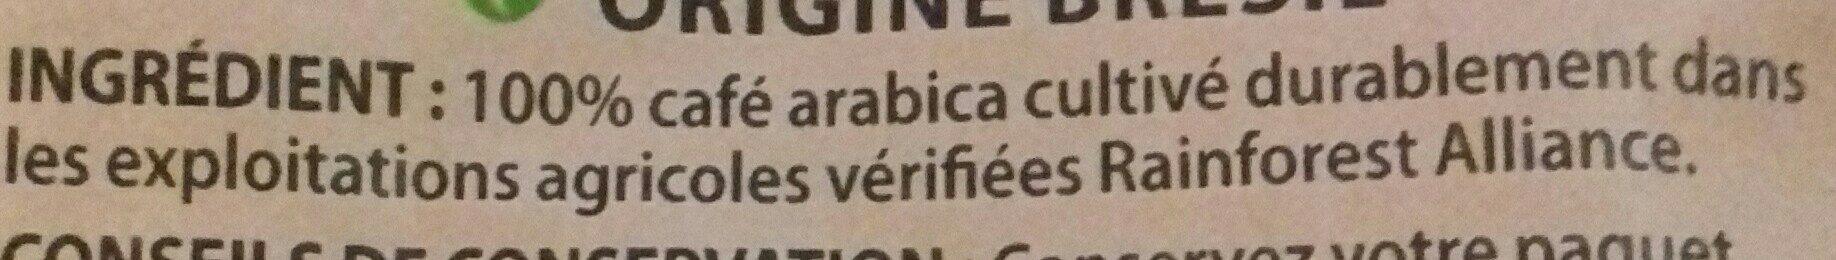 Pur arabica Brésil grains - Ingrediënten - fr